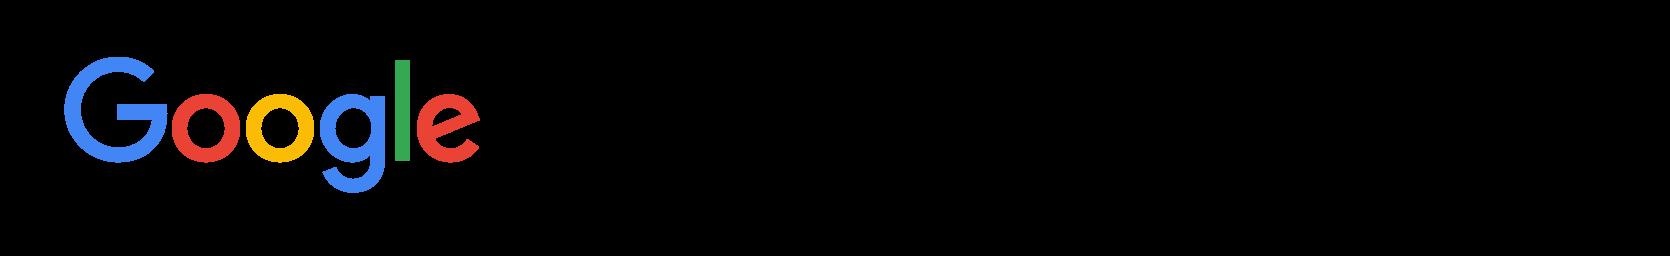 logo_lockup_maps_javascript_api_color